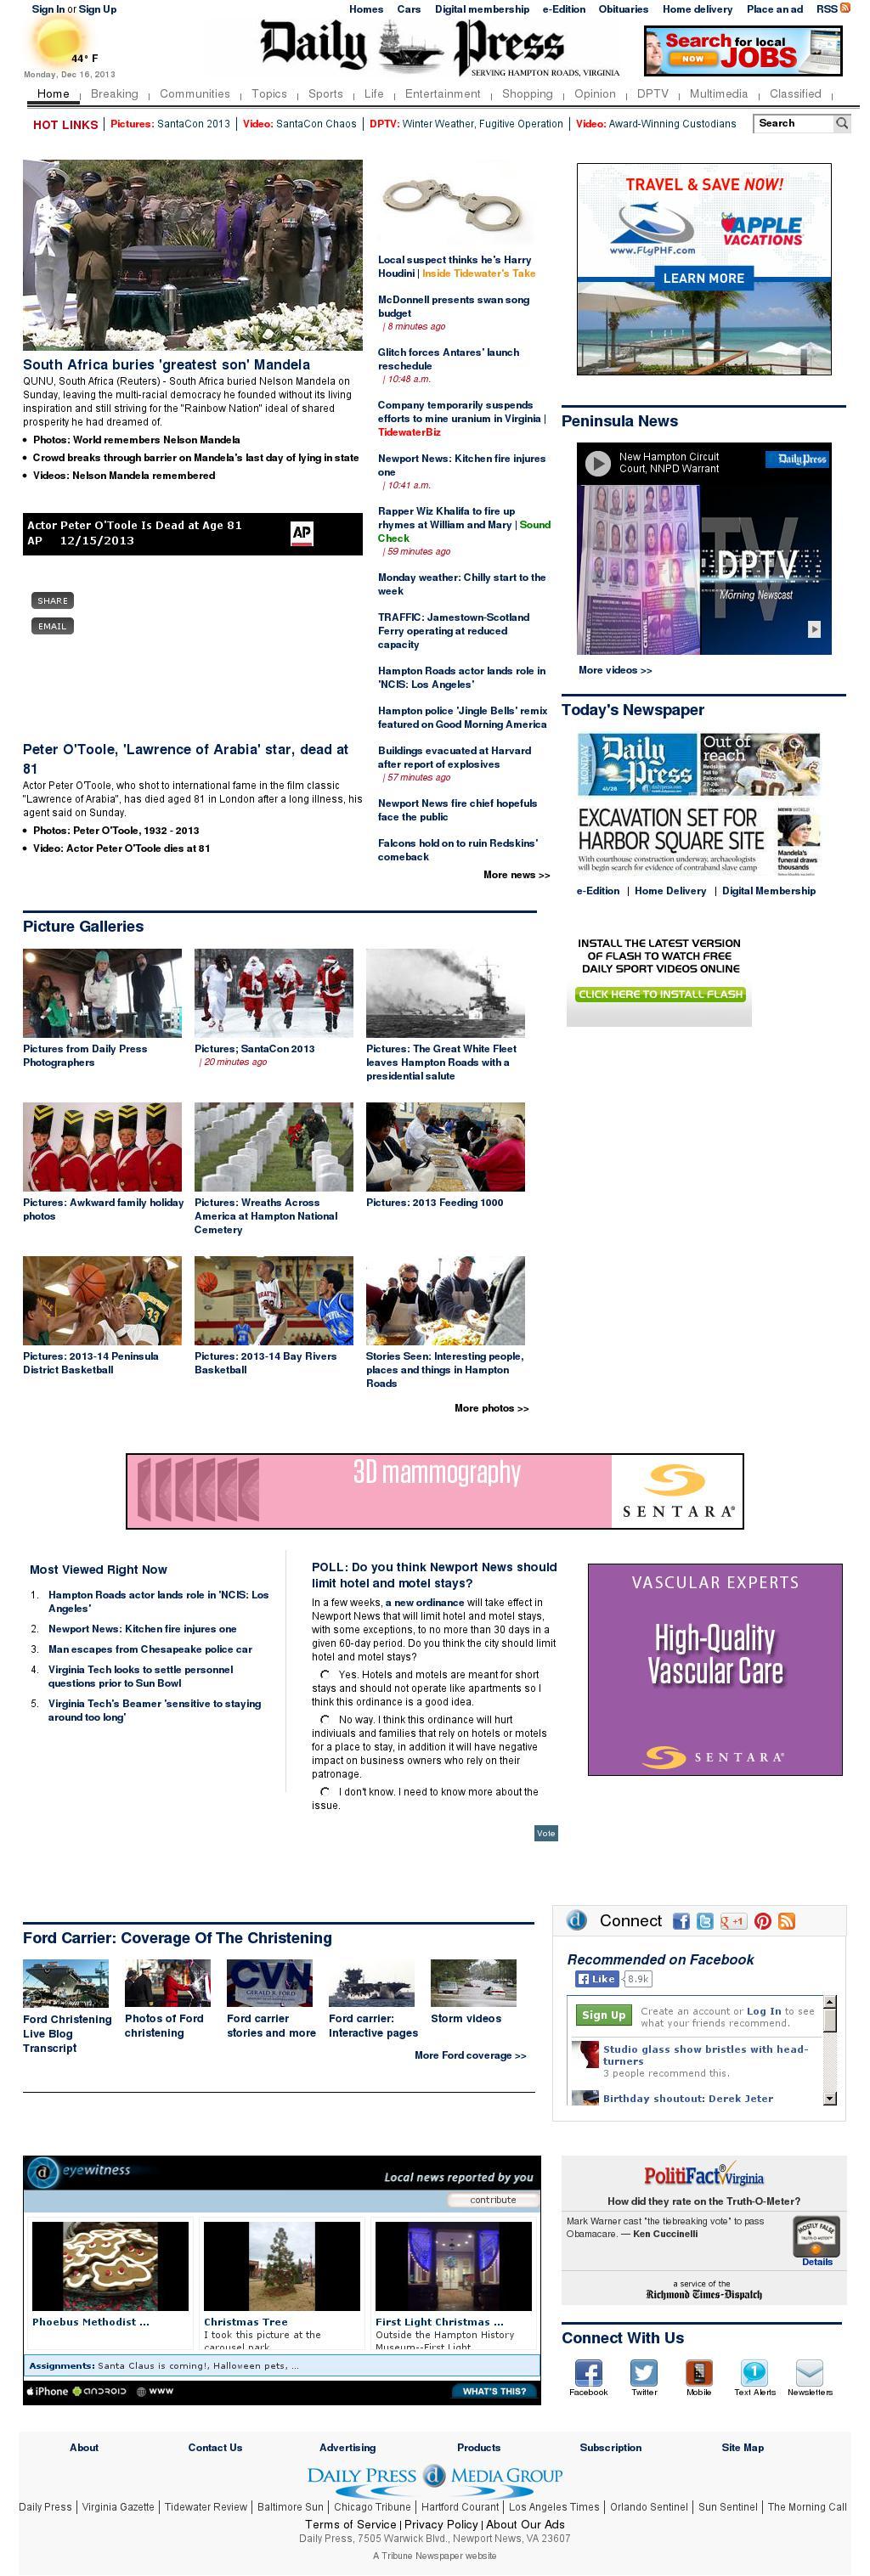 (Hampton Roads) Daily Press at Monday Dec. 16, 2013, 5:03 p.m. UTC